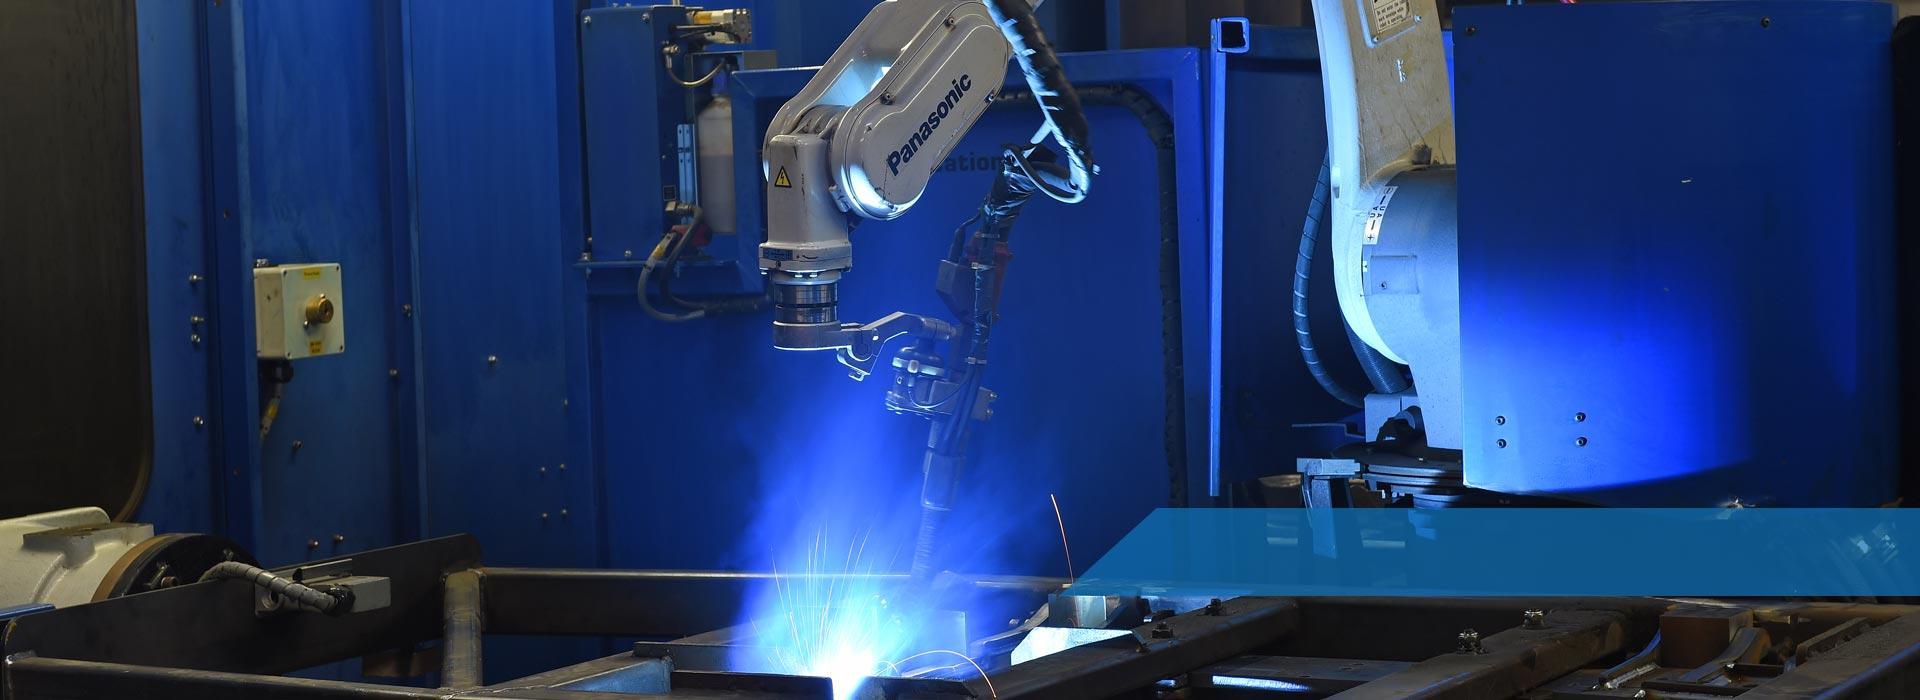 Commercial Vehicle Fabrication Sherburn Metalwork